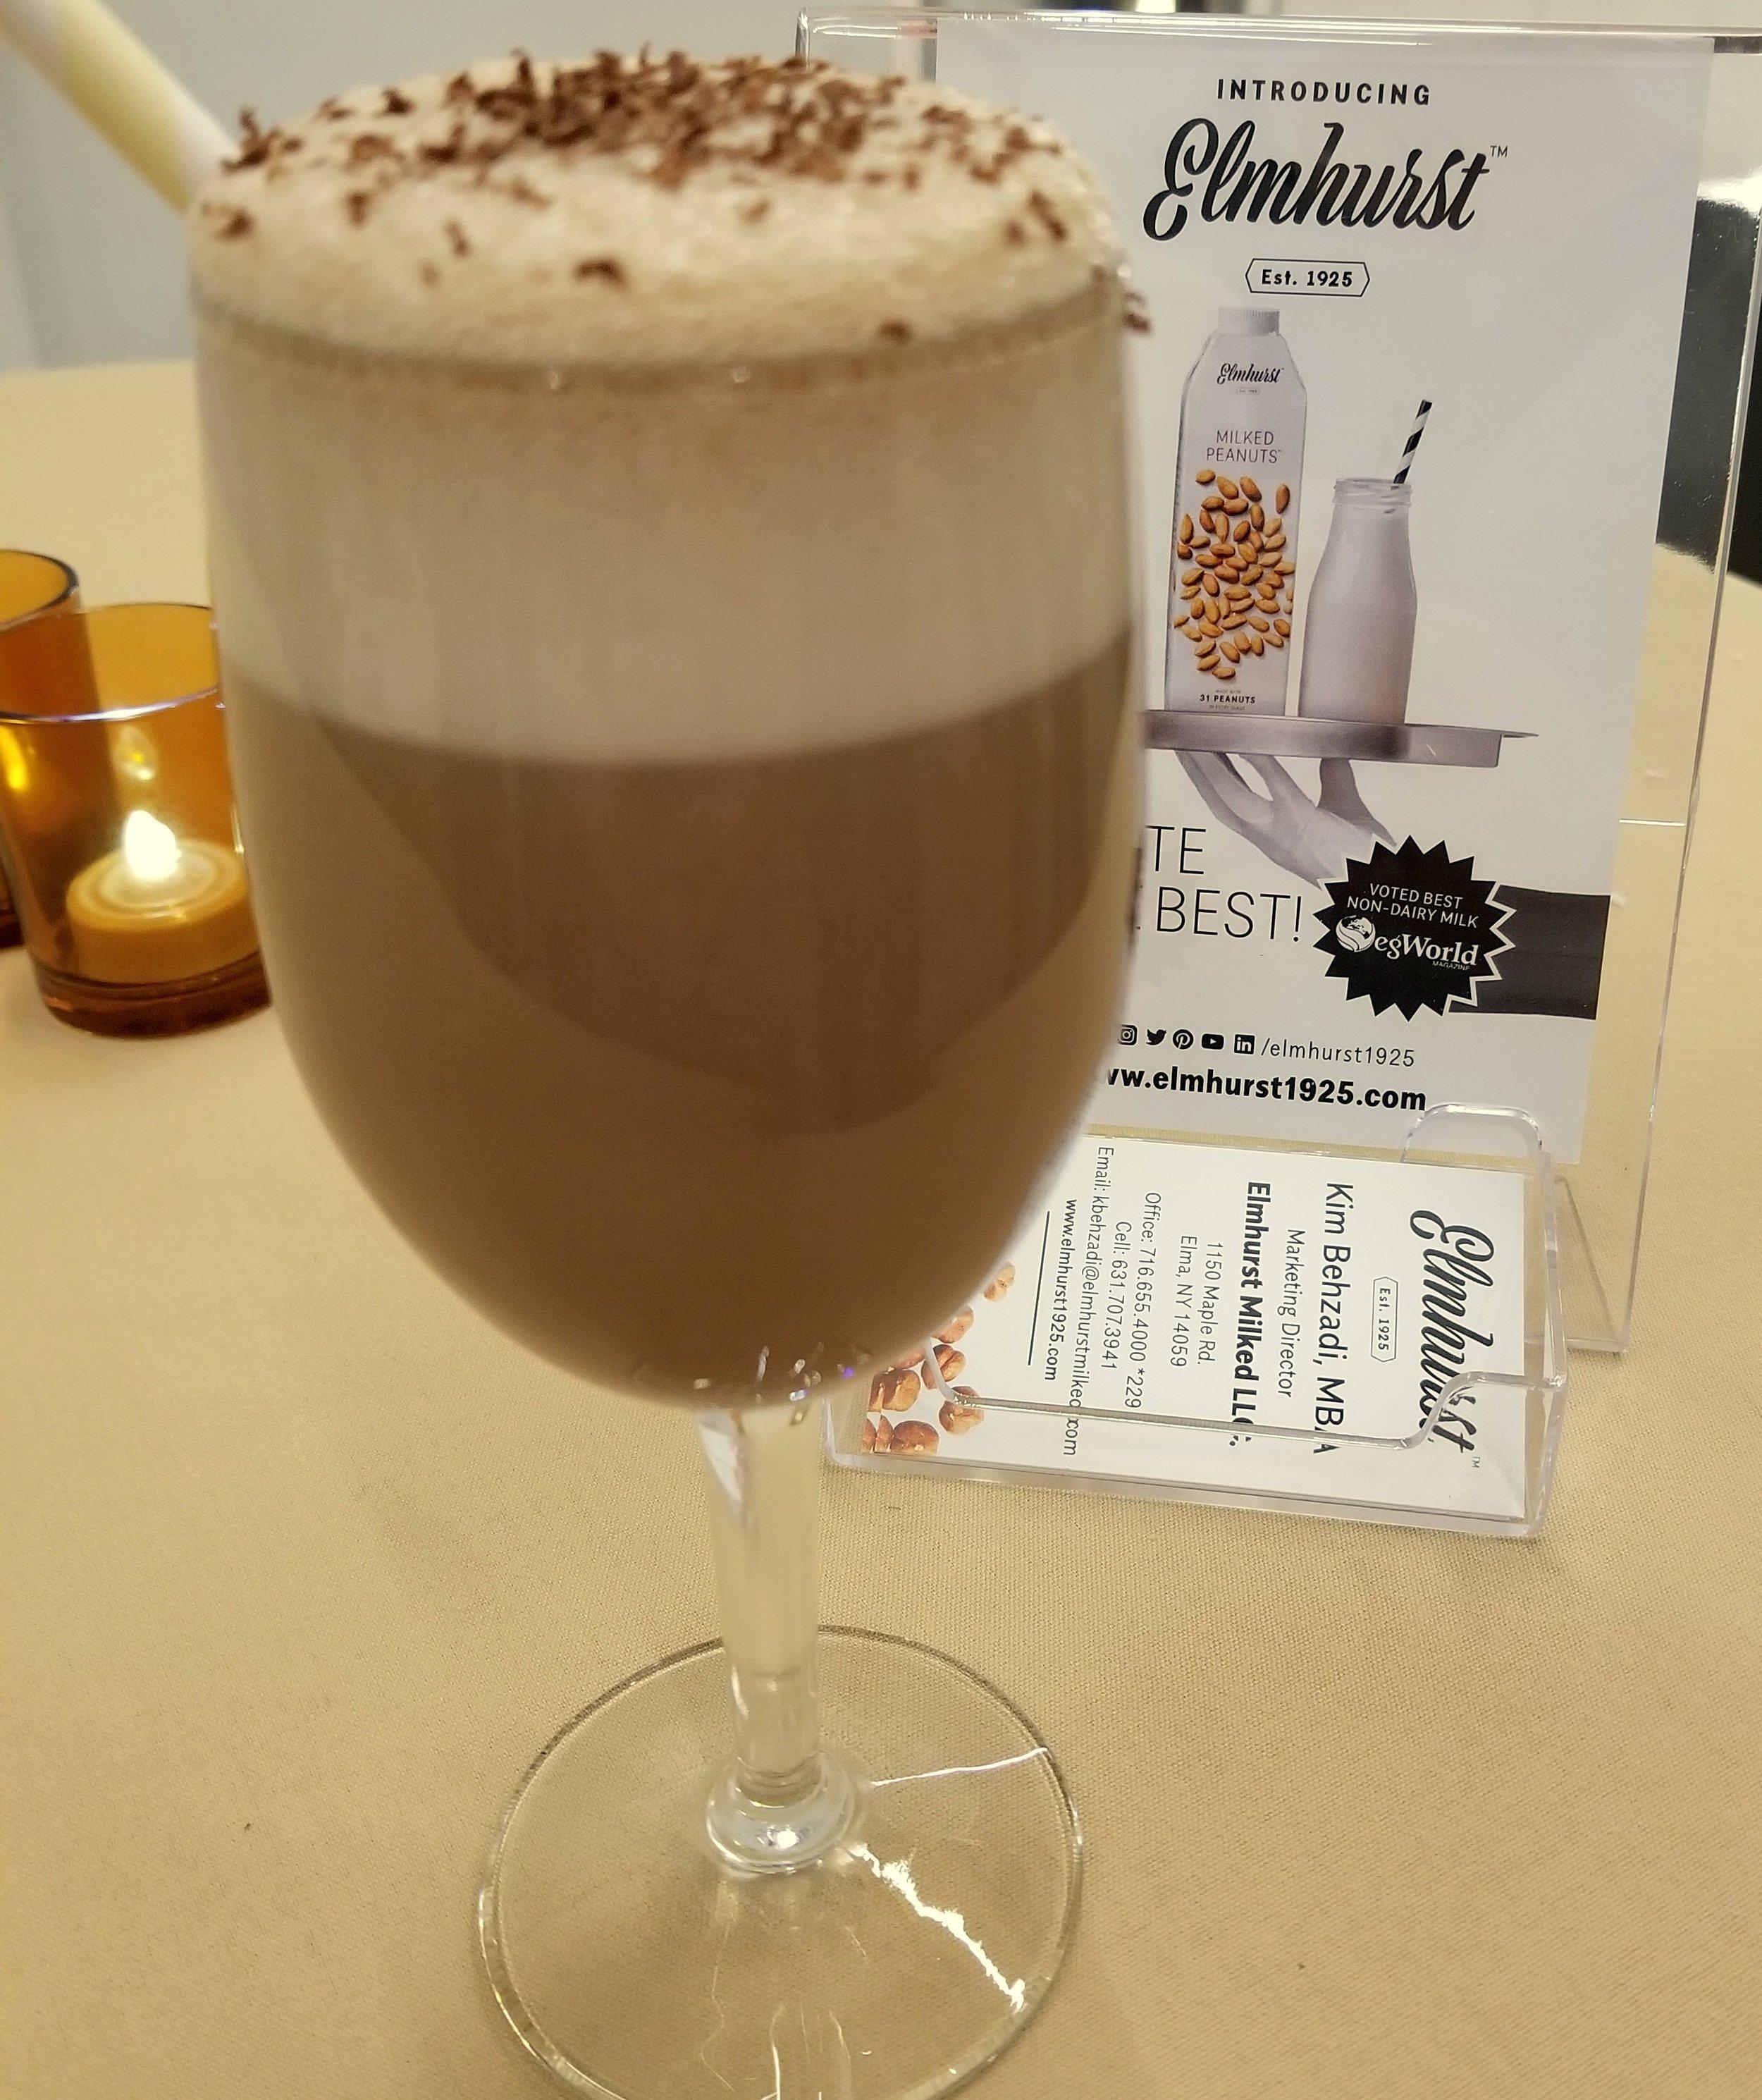 The Frothy Peanut: Milked Peanuts Chocolate, Browns Cream Soda, Lemon Juice, Aged Rum, Egg White, Demerara, Cynar